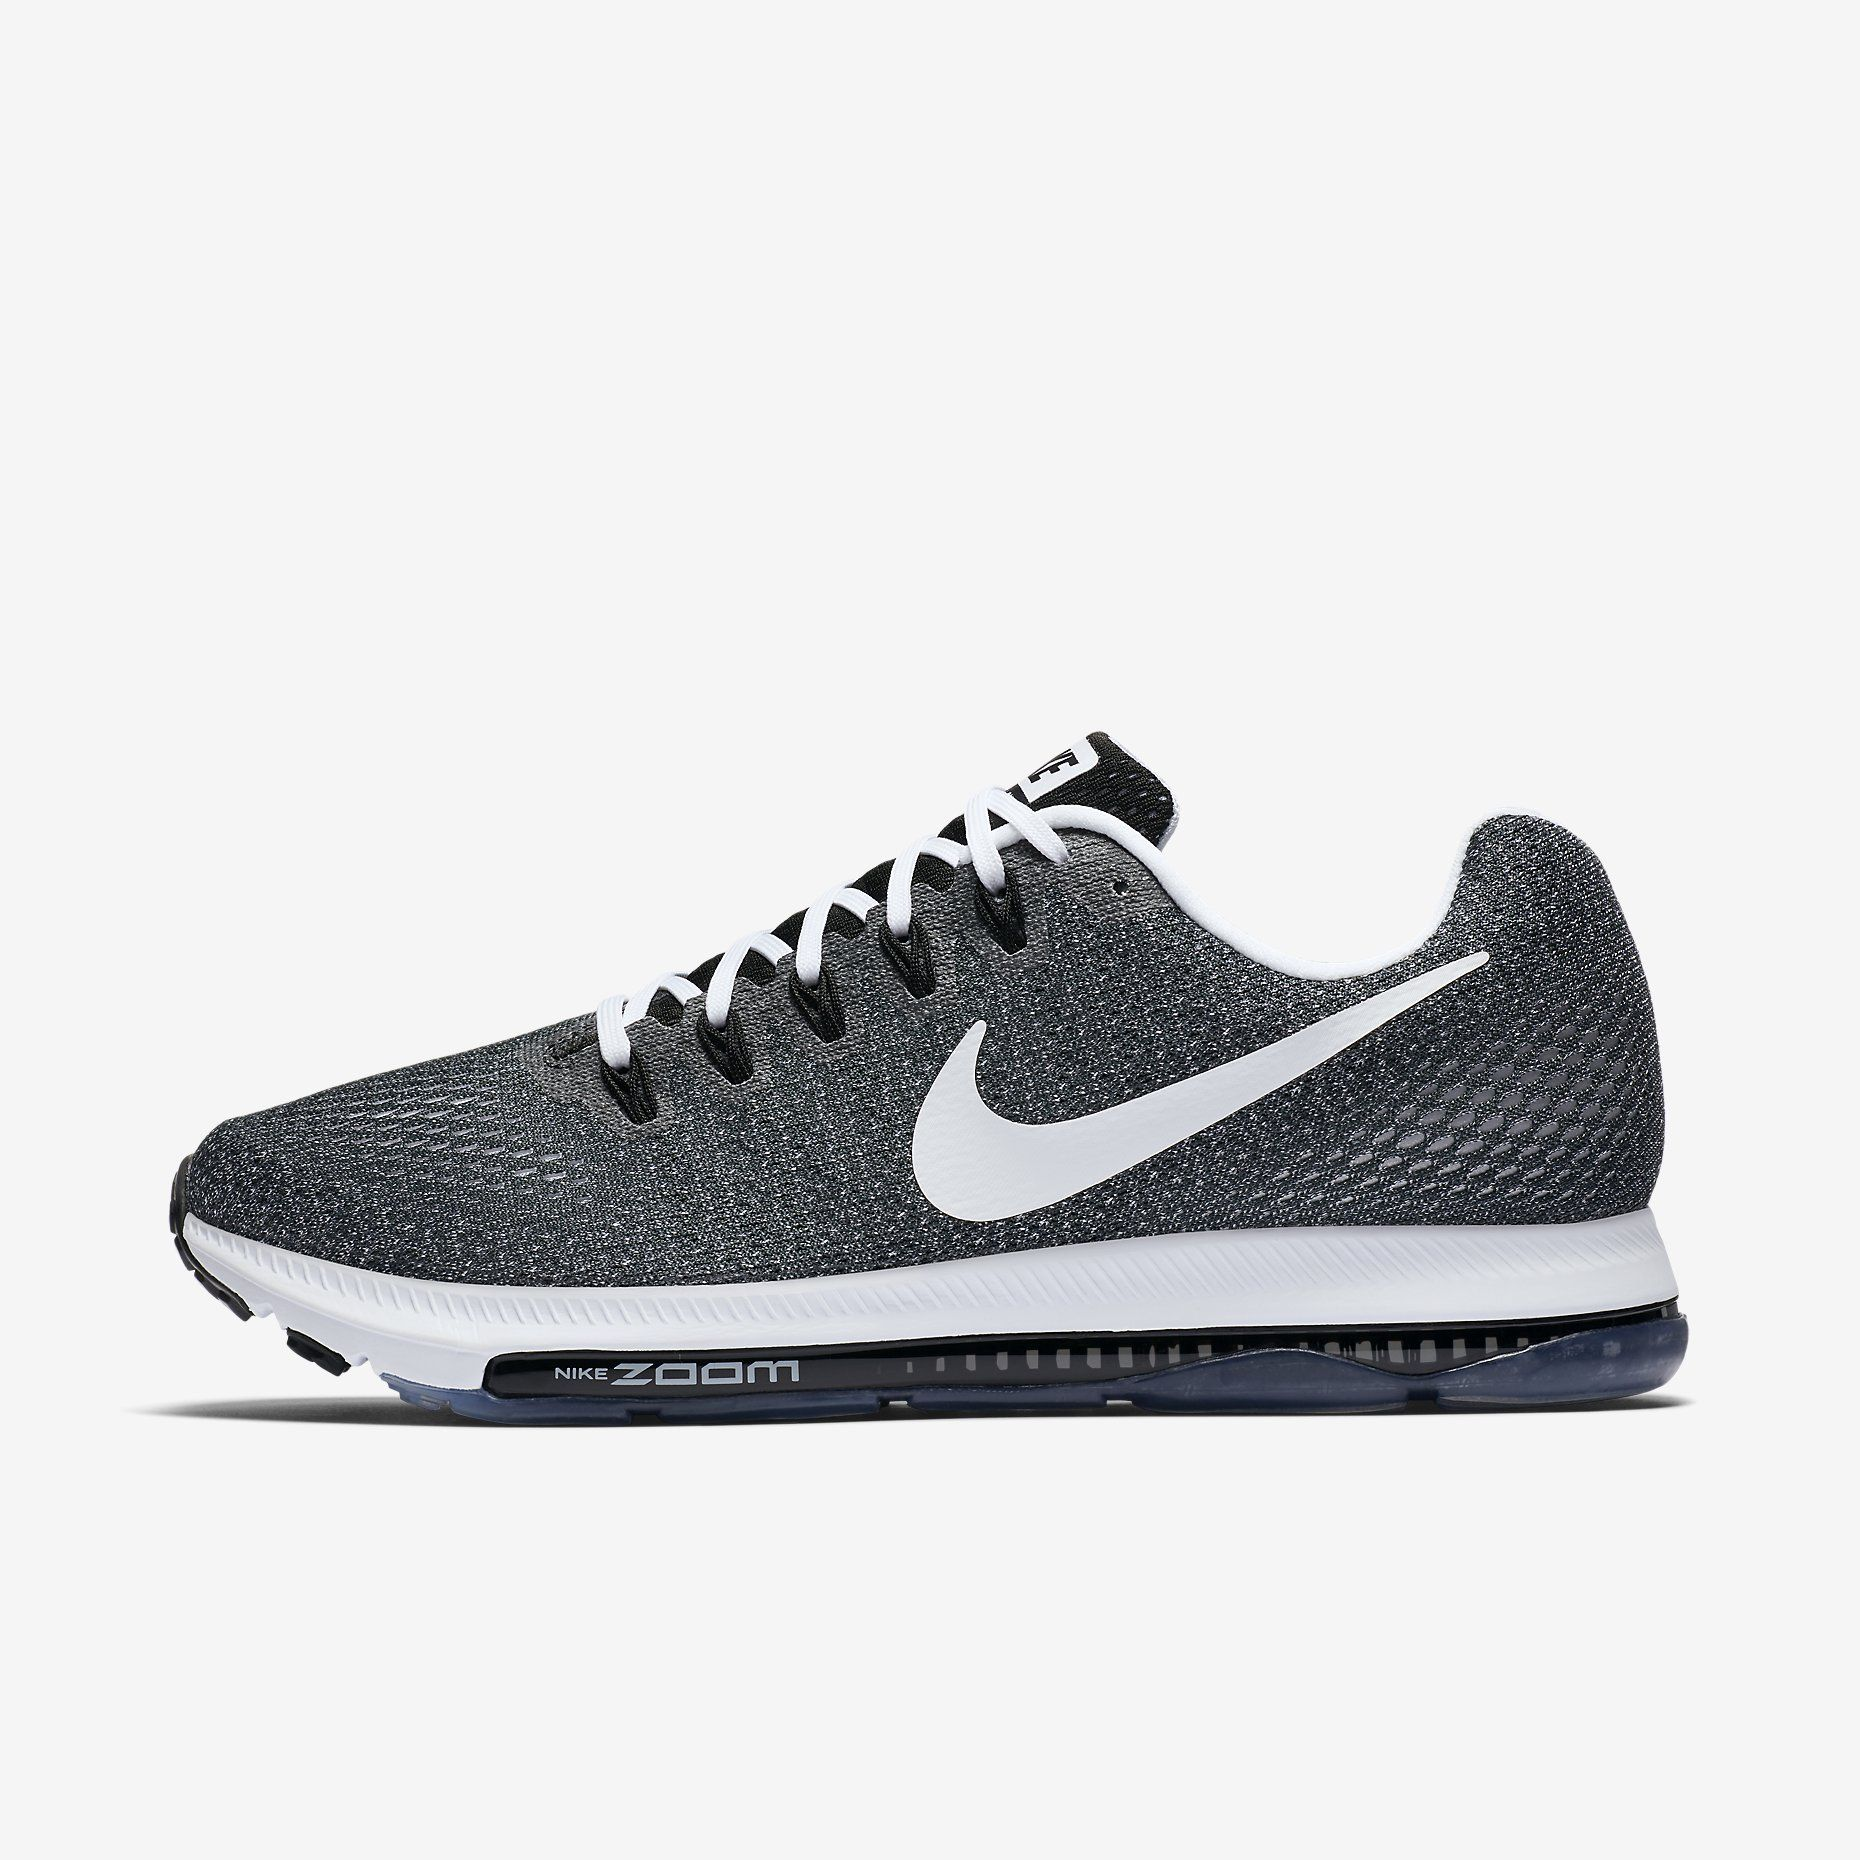 Running shoes for men, All black nikes